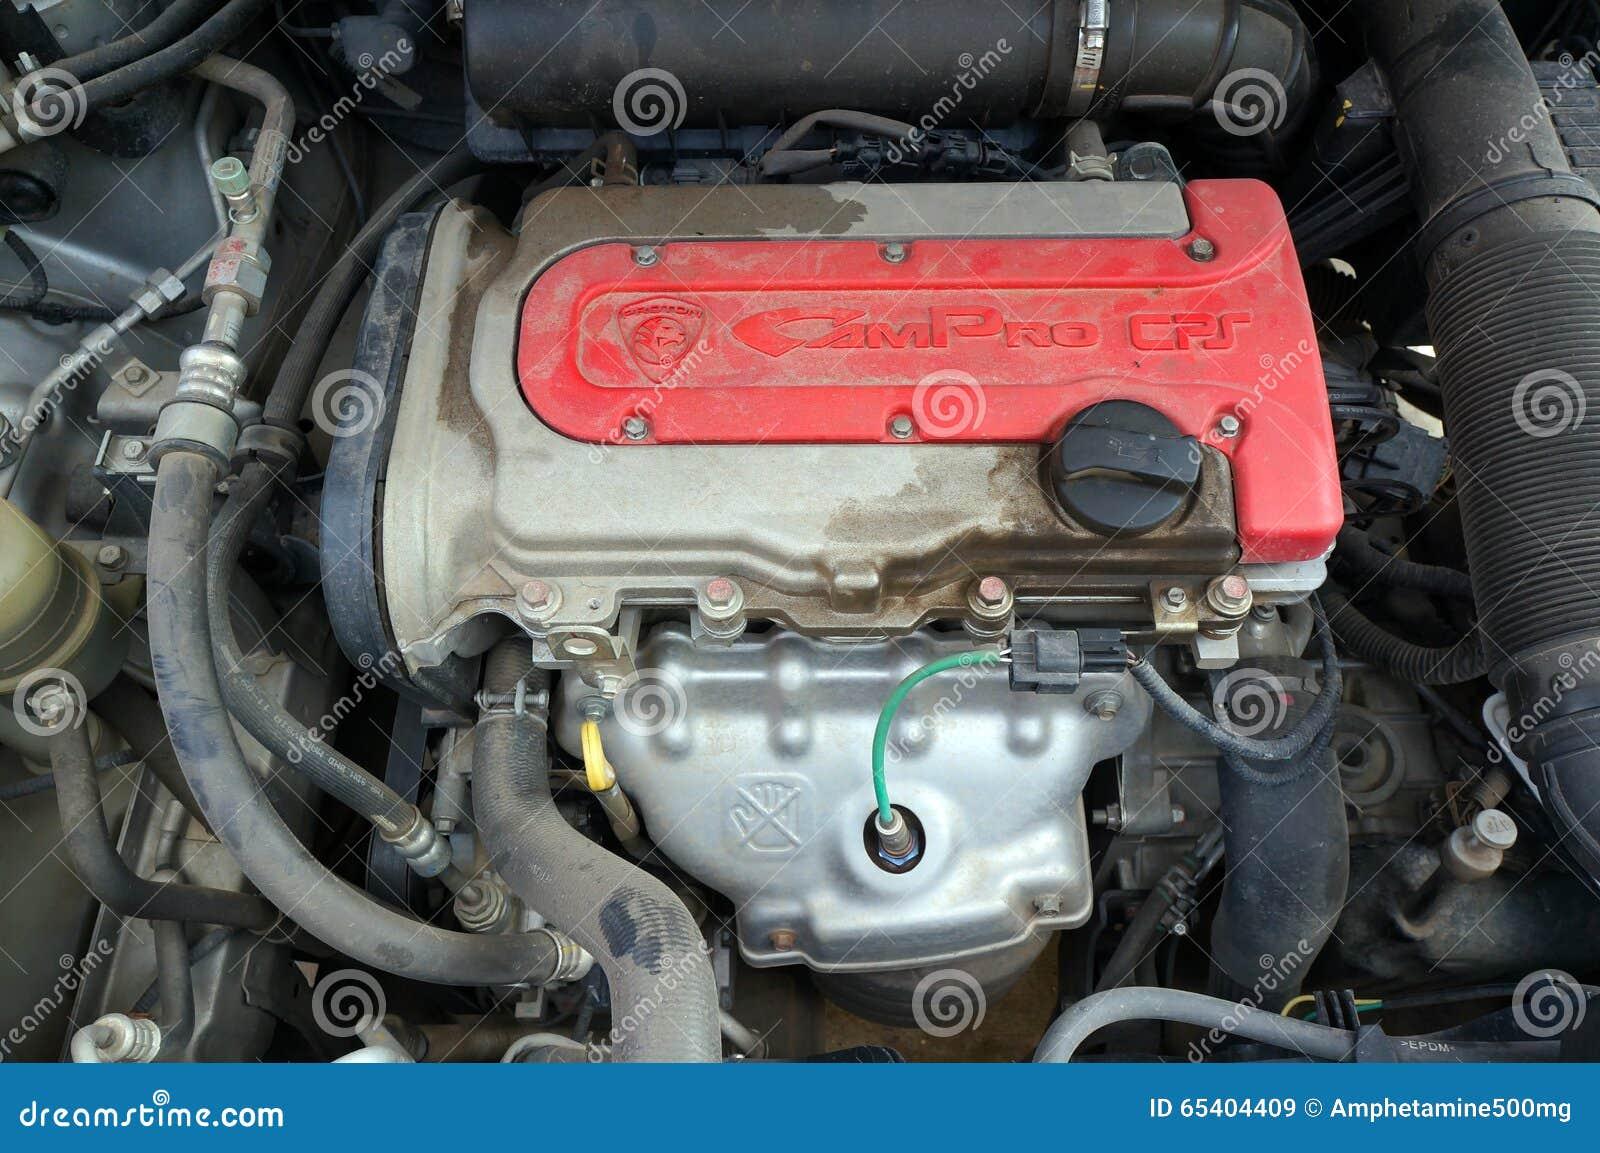 proton exora engine editorial stock image image  machinery